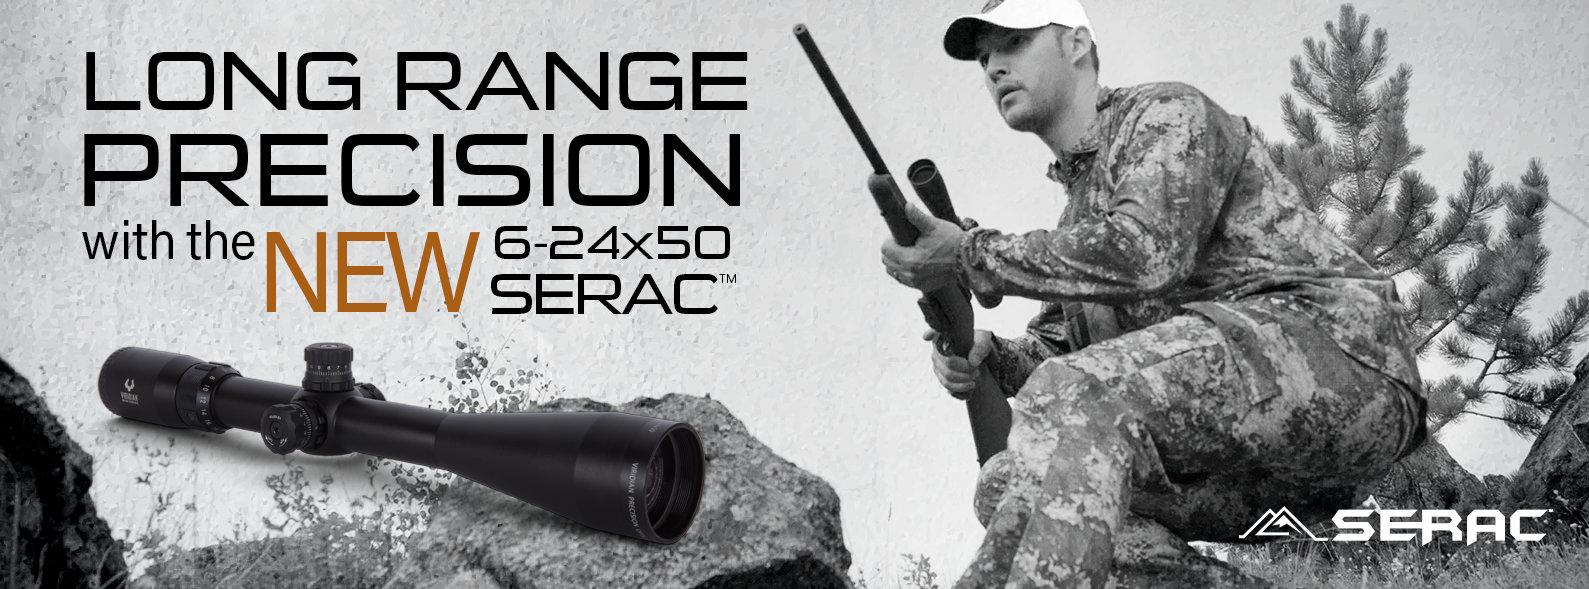 Long Range Precision with the NEW 6-24X50 Serac TM